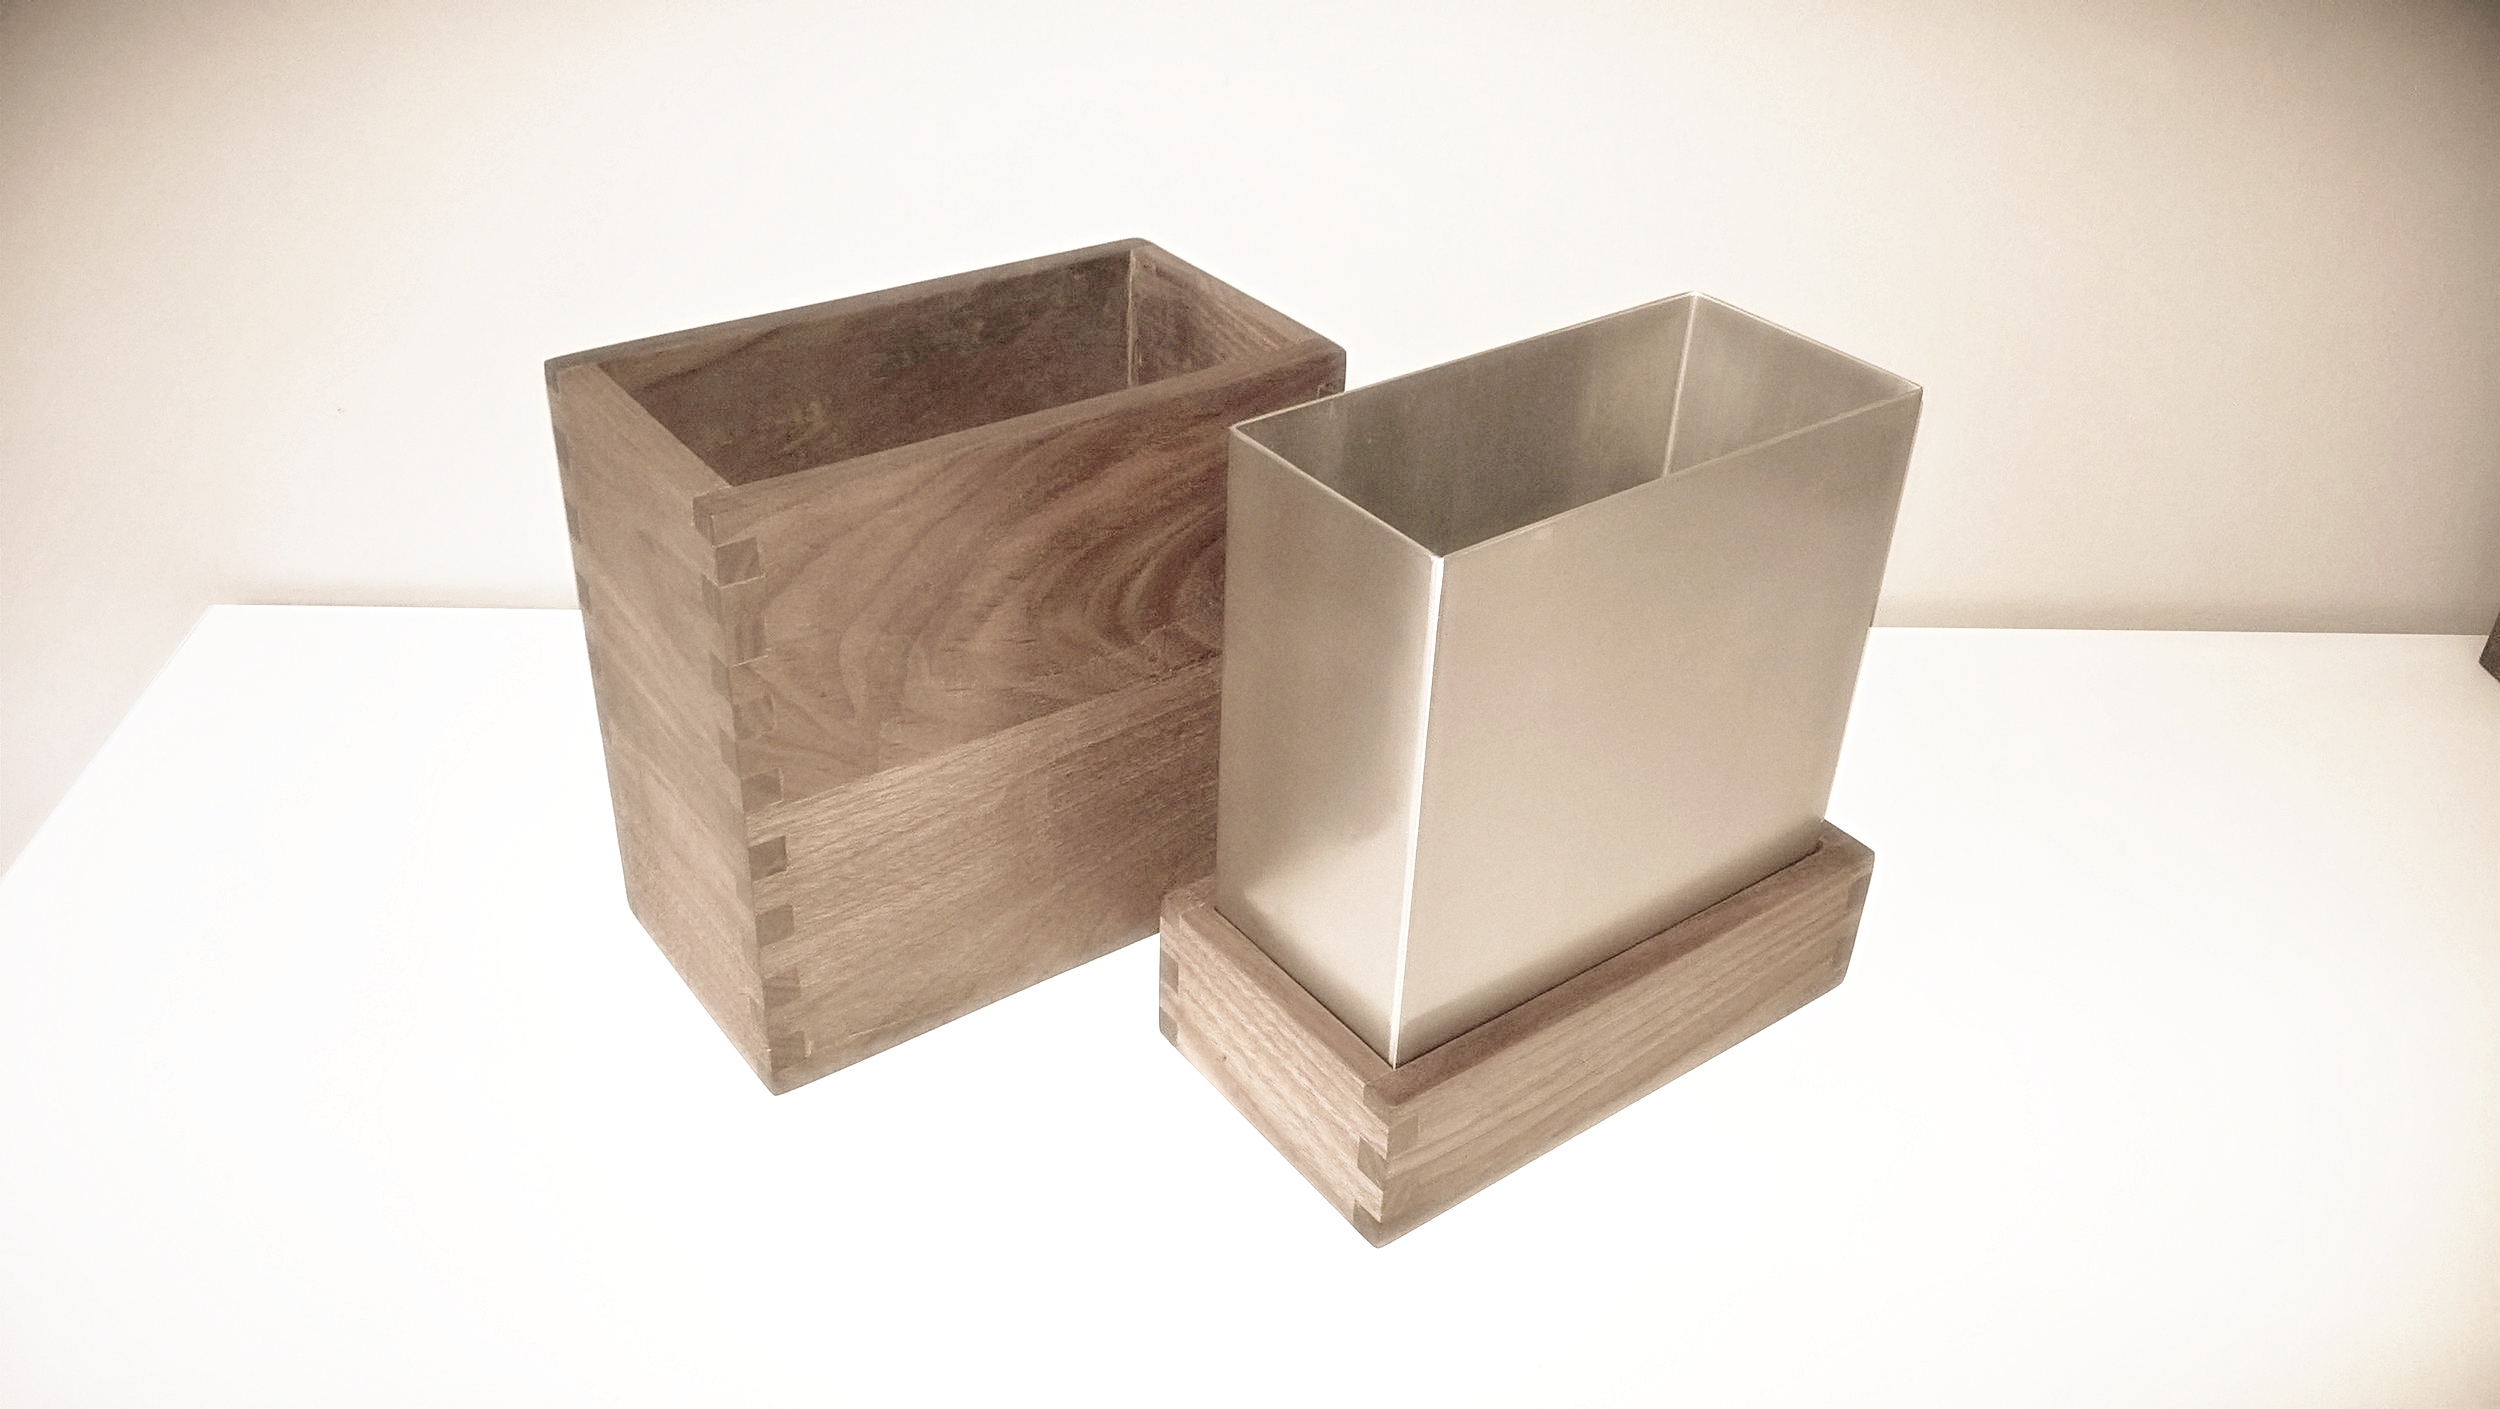 Penlau®  dishbox - medium Træ box, olieret valnød 15,5/12,5/9 cm (b/d/h) Stål box, børstet rustfrit stål 13,2/10,215,5 cm (b/d/h) Låg til box, olieret valnød 15,5/12,5/9 cm (b/d/h) Et sæt af 3 dele kr. 1.000,- Varenr. Box3-888-04-medium